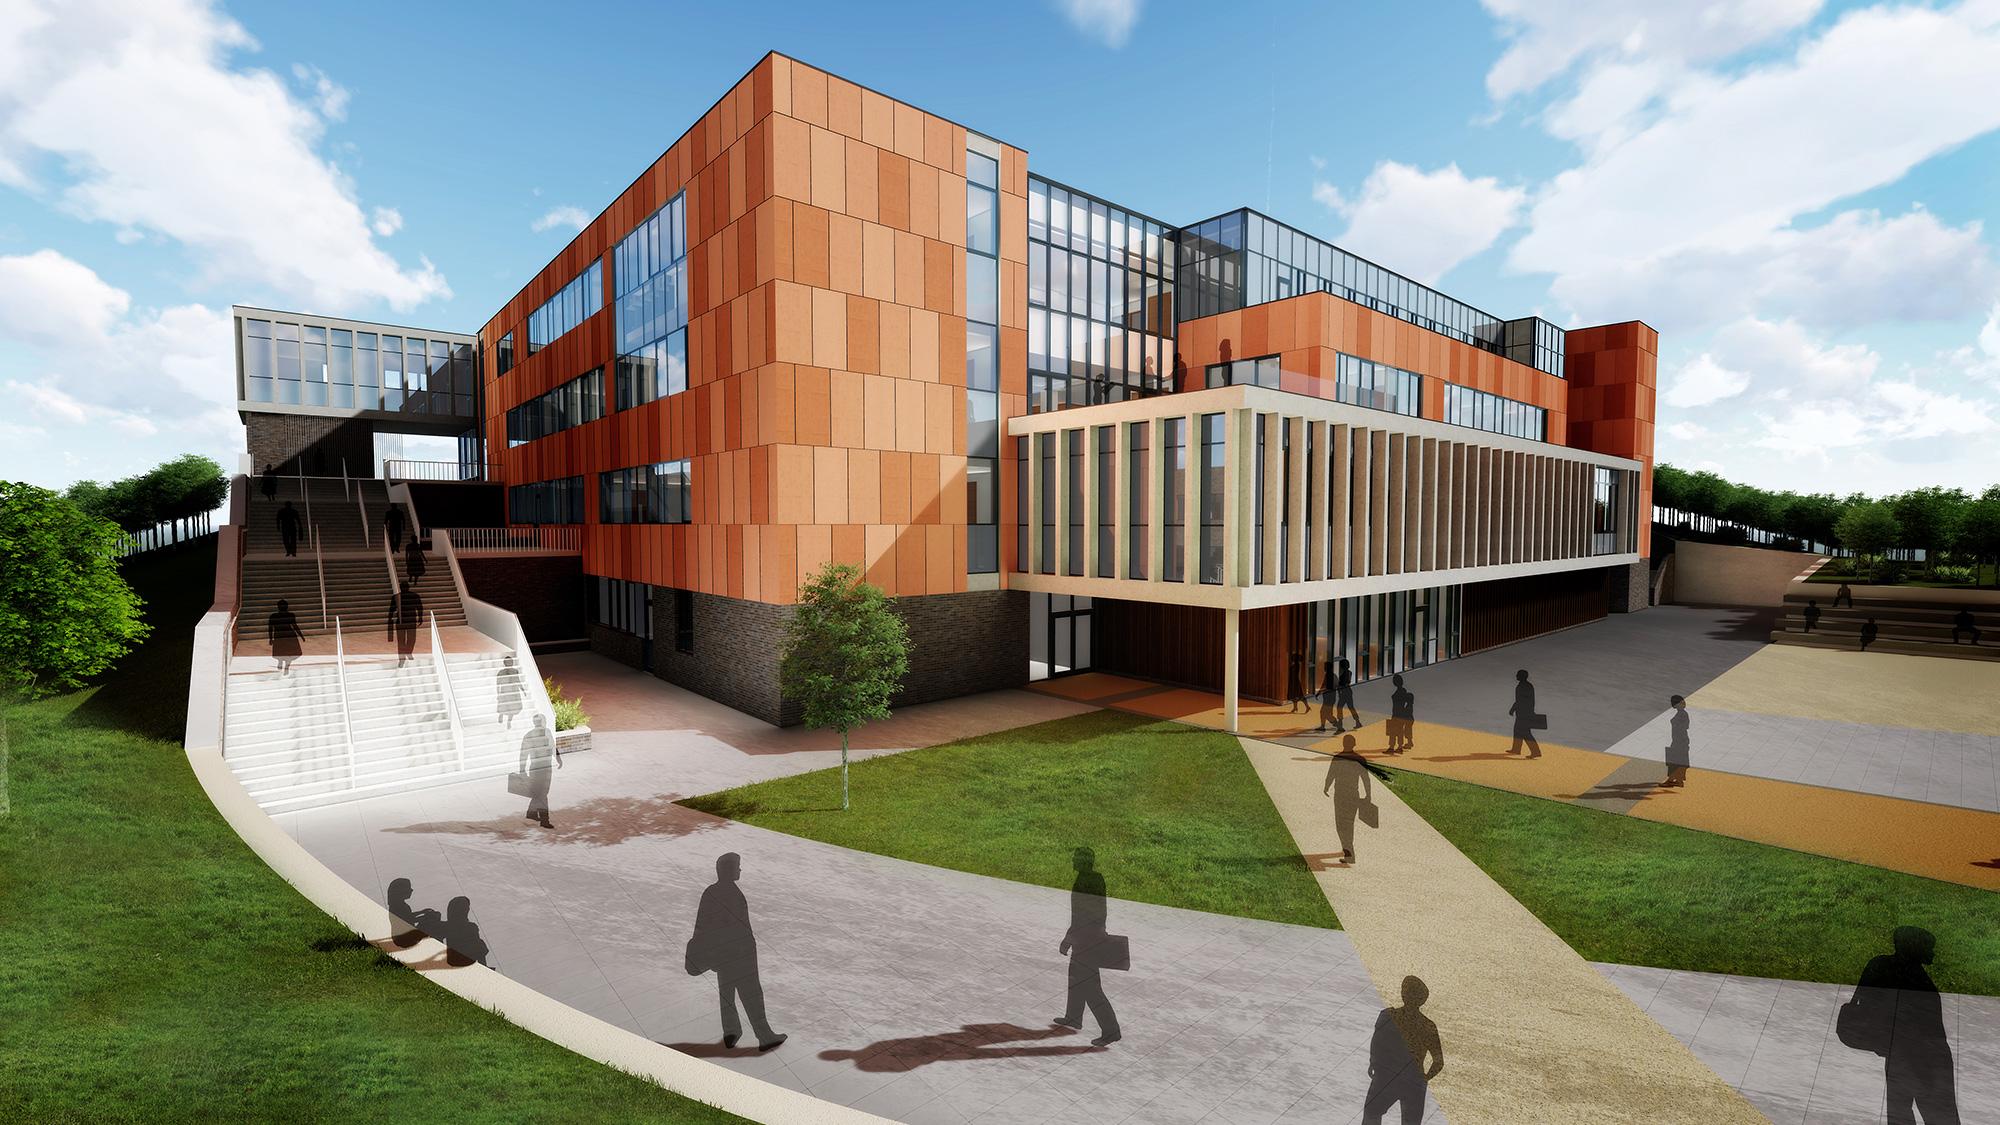 Strule Education Campus